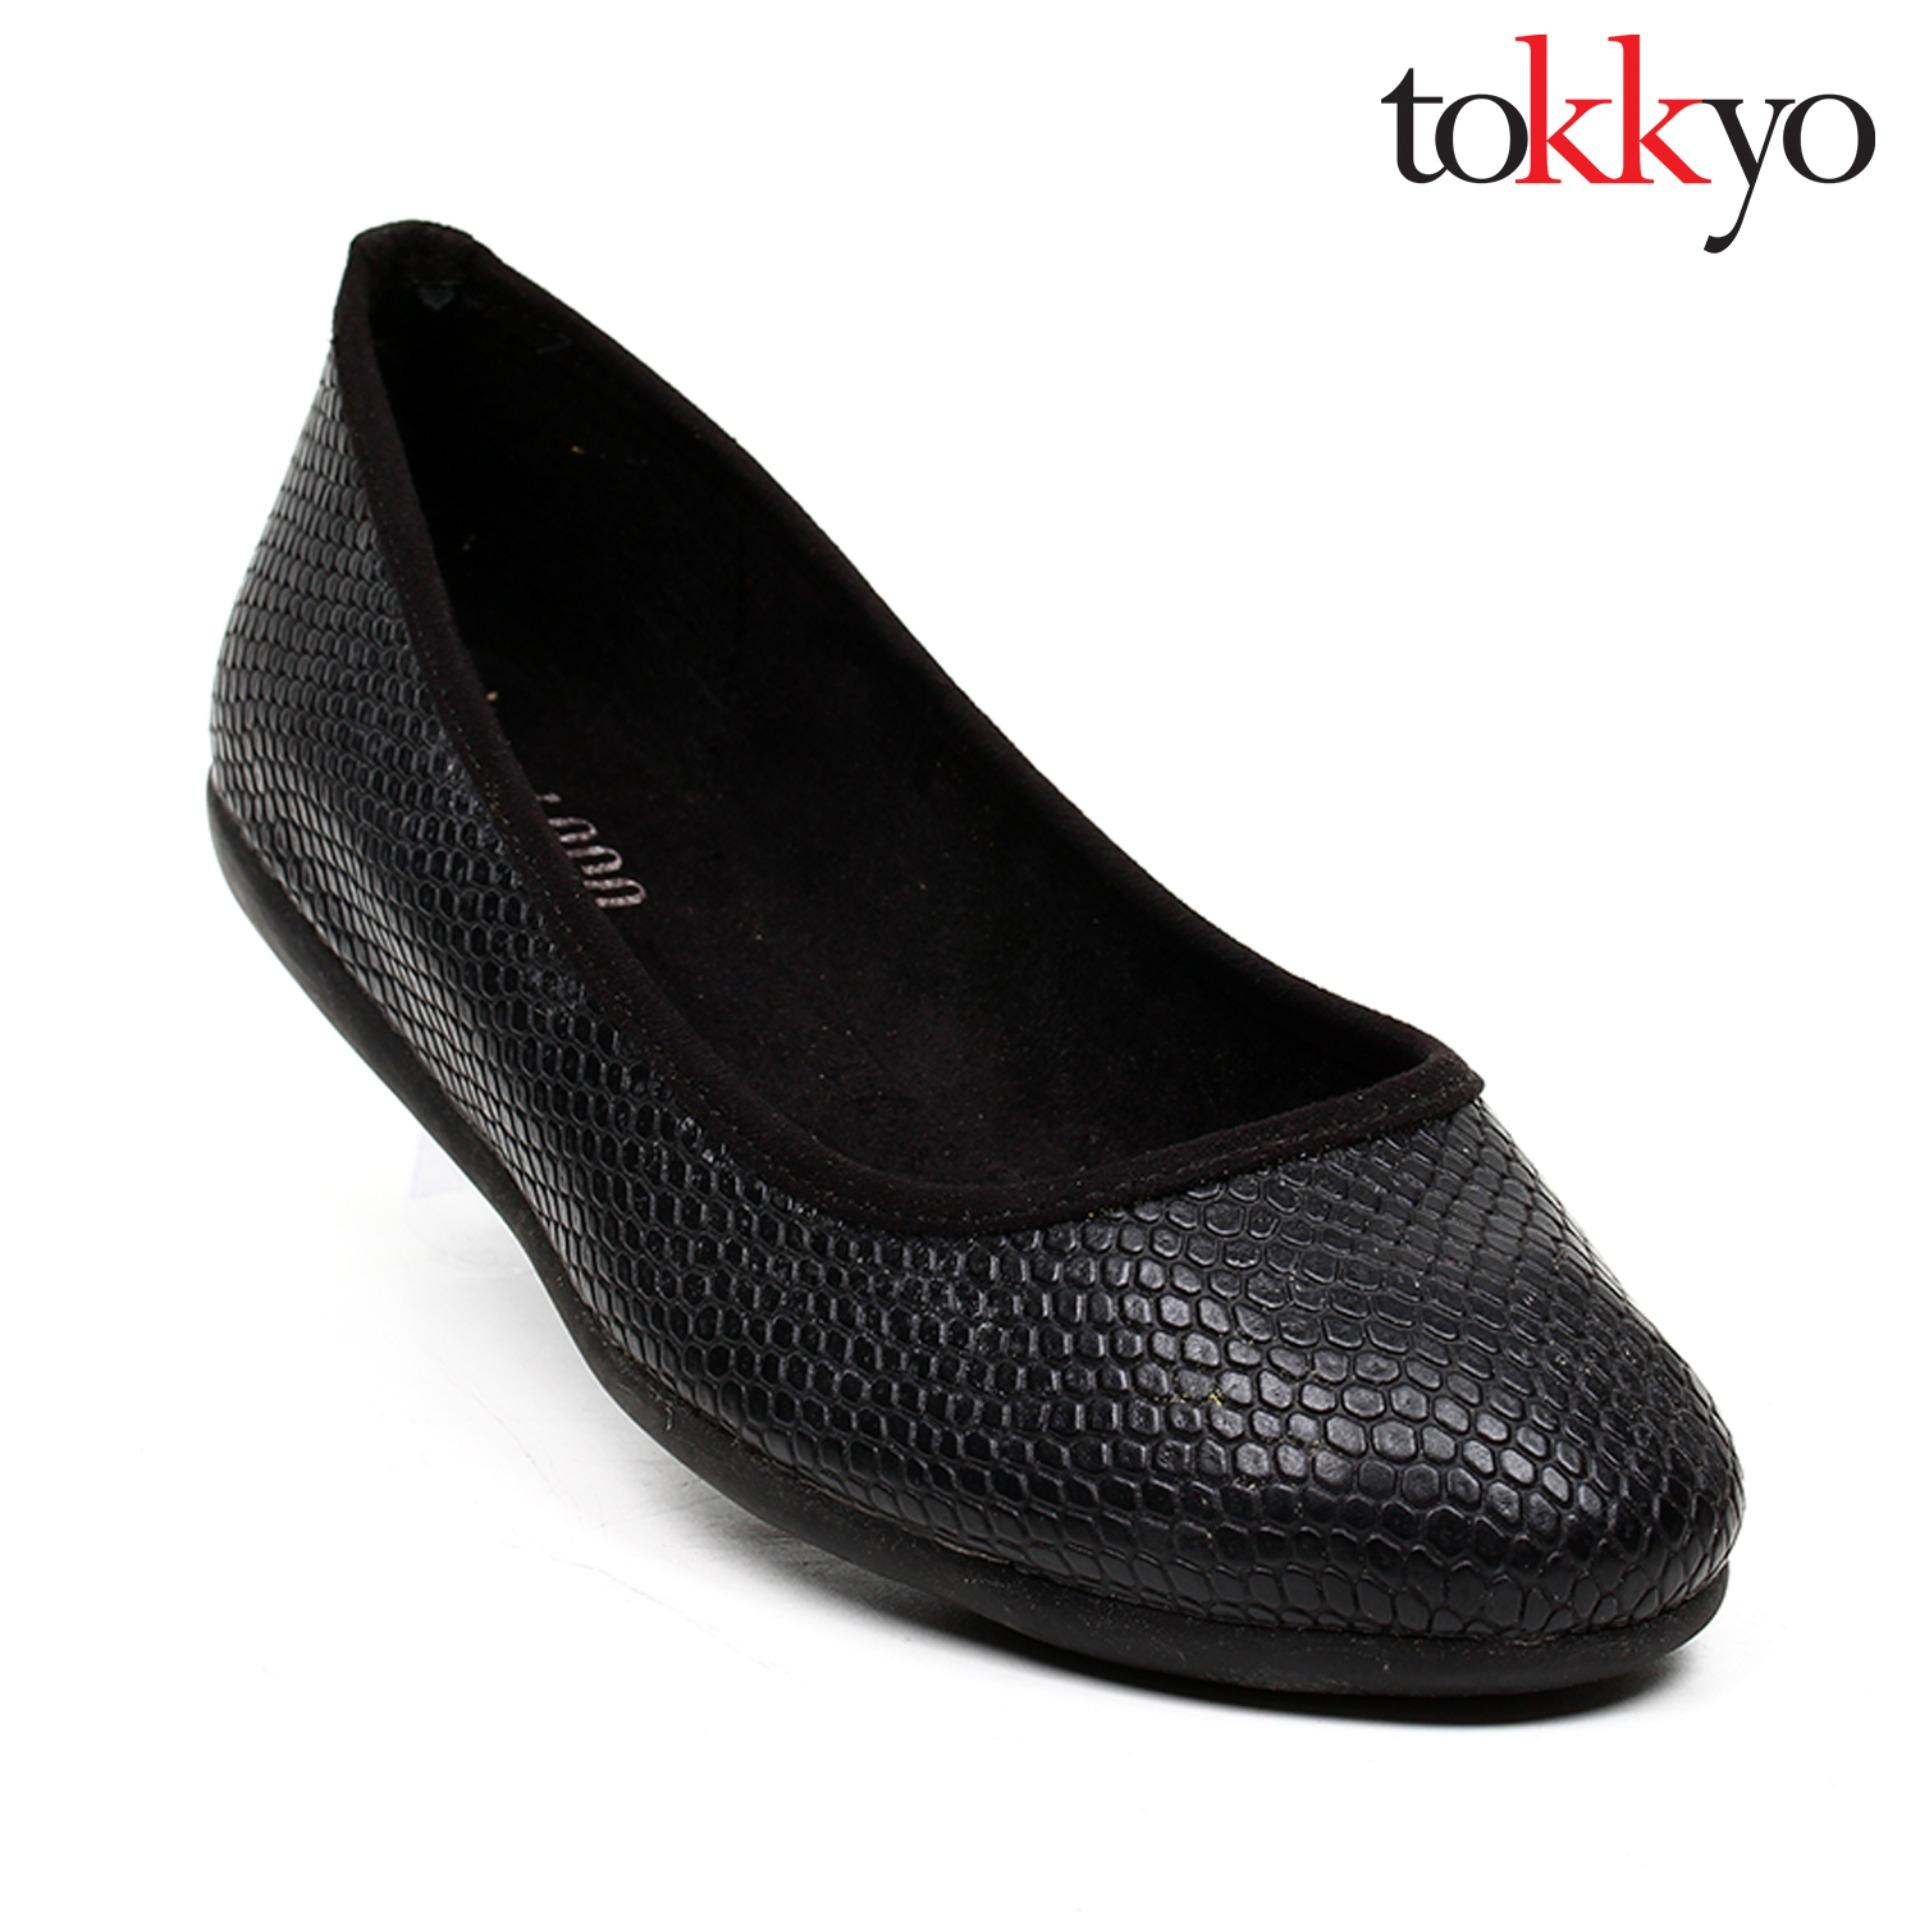 Tokkyo Women's Aster Ballet Flats (Black Glossy Rough)